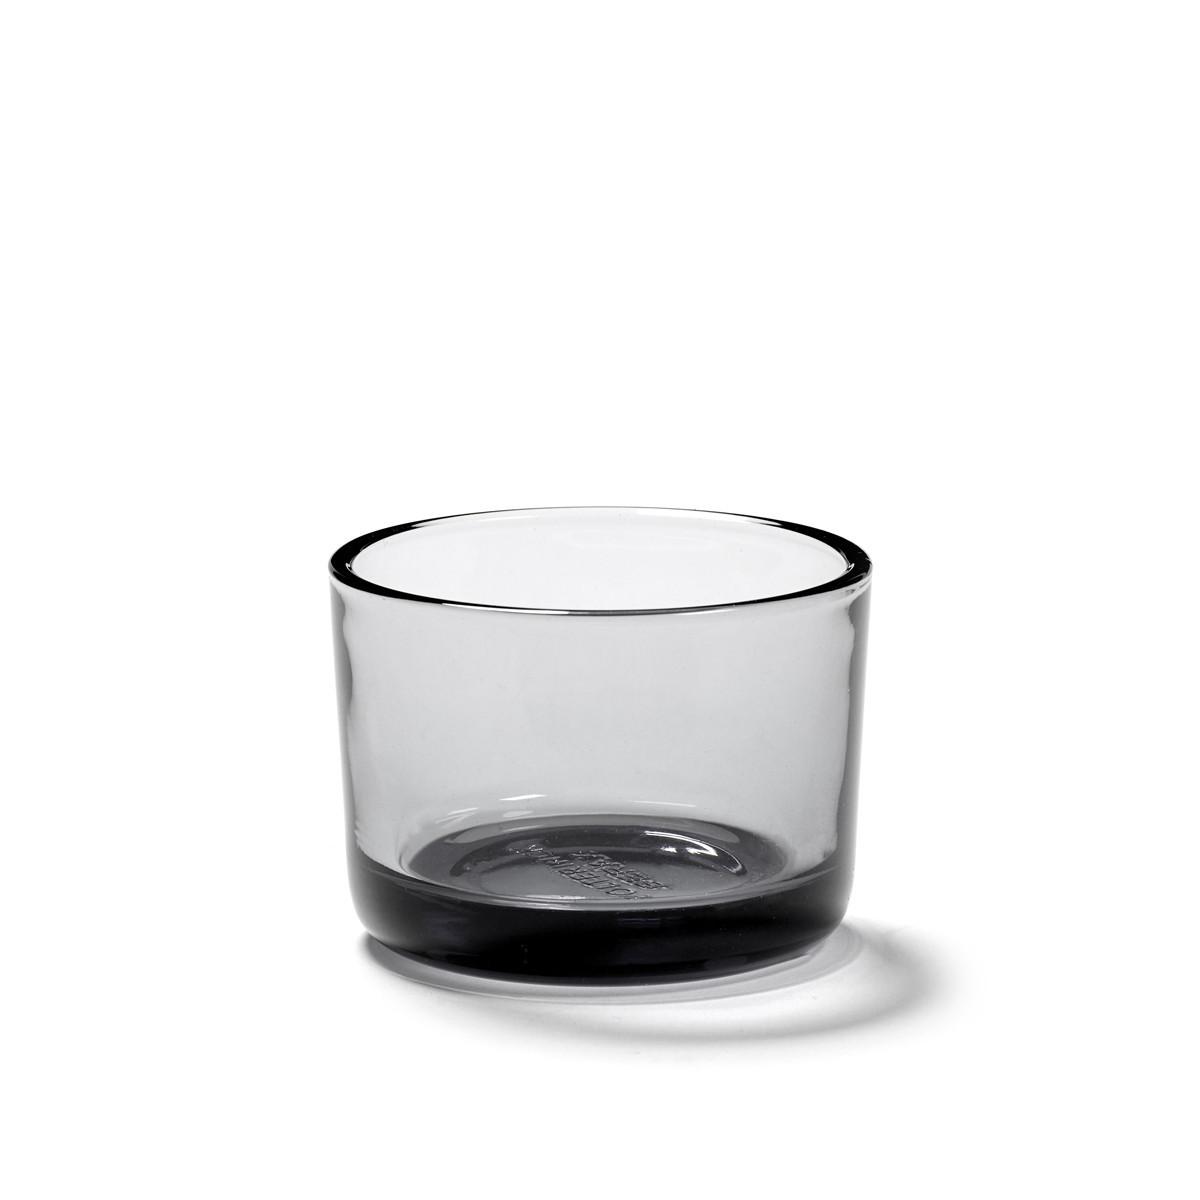 Prosta niewielka szklanka Tumbler Heii Wolterinck poj. 12 ml Serax